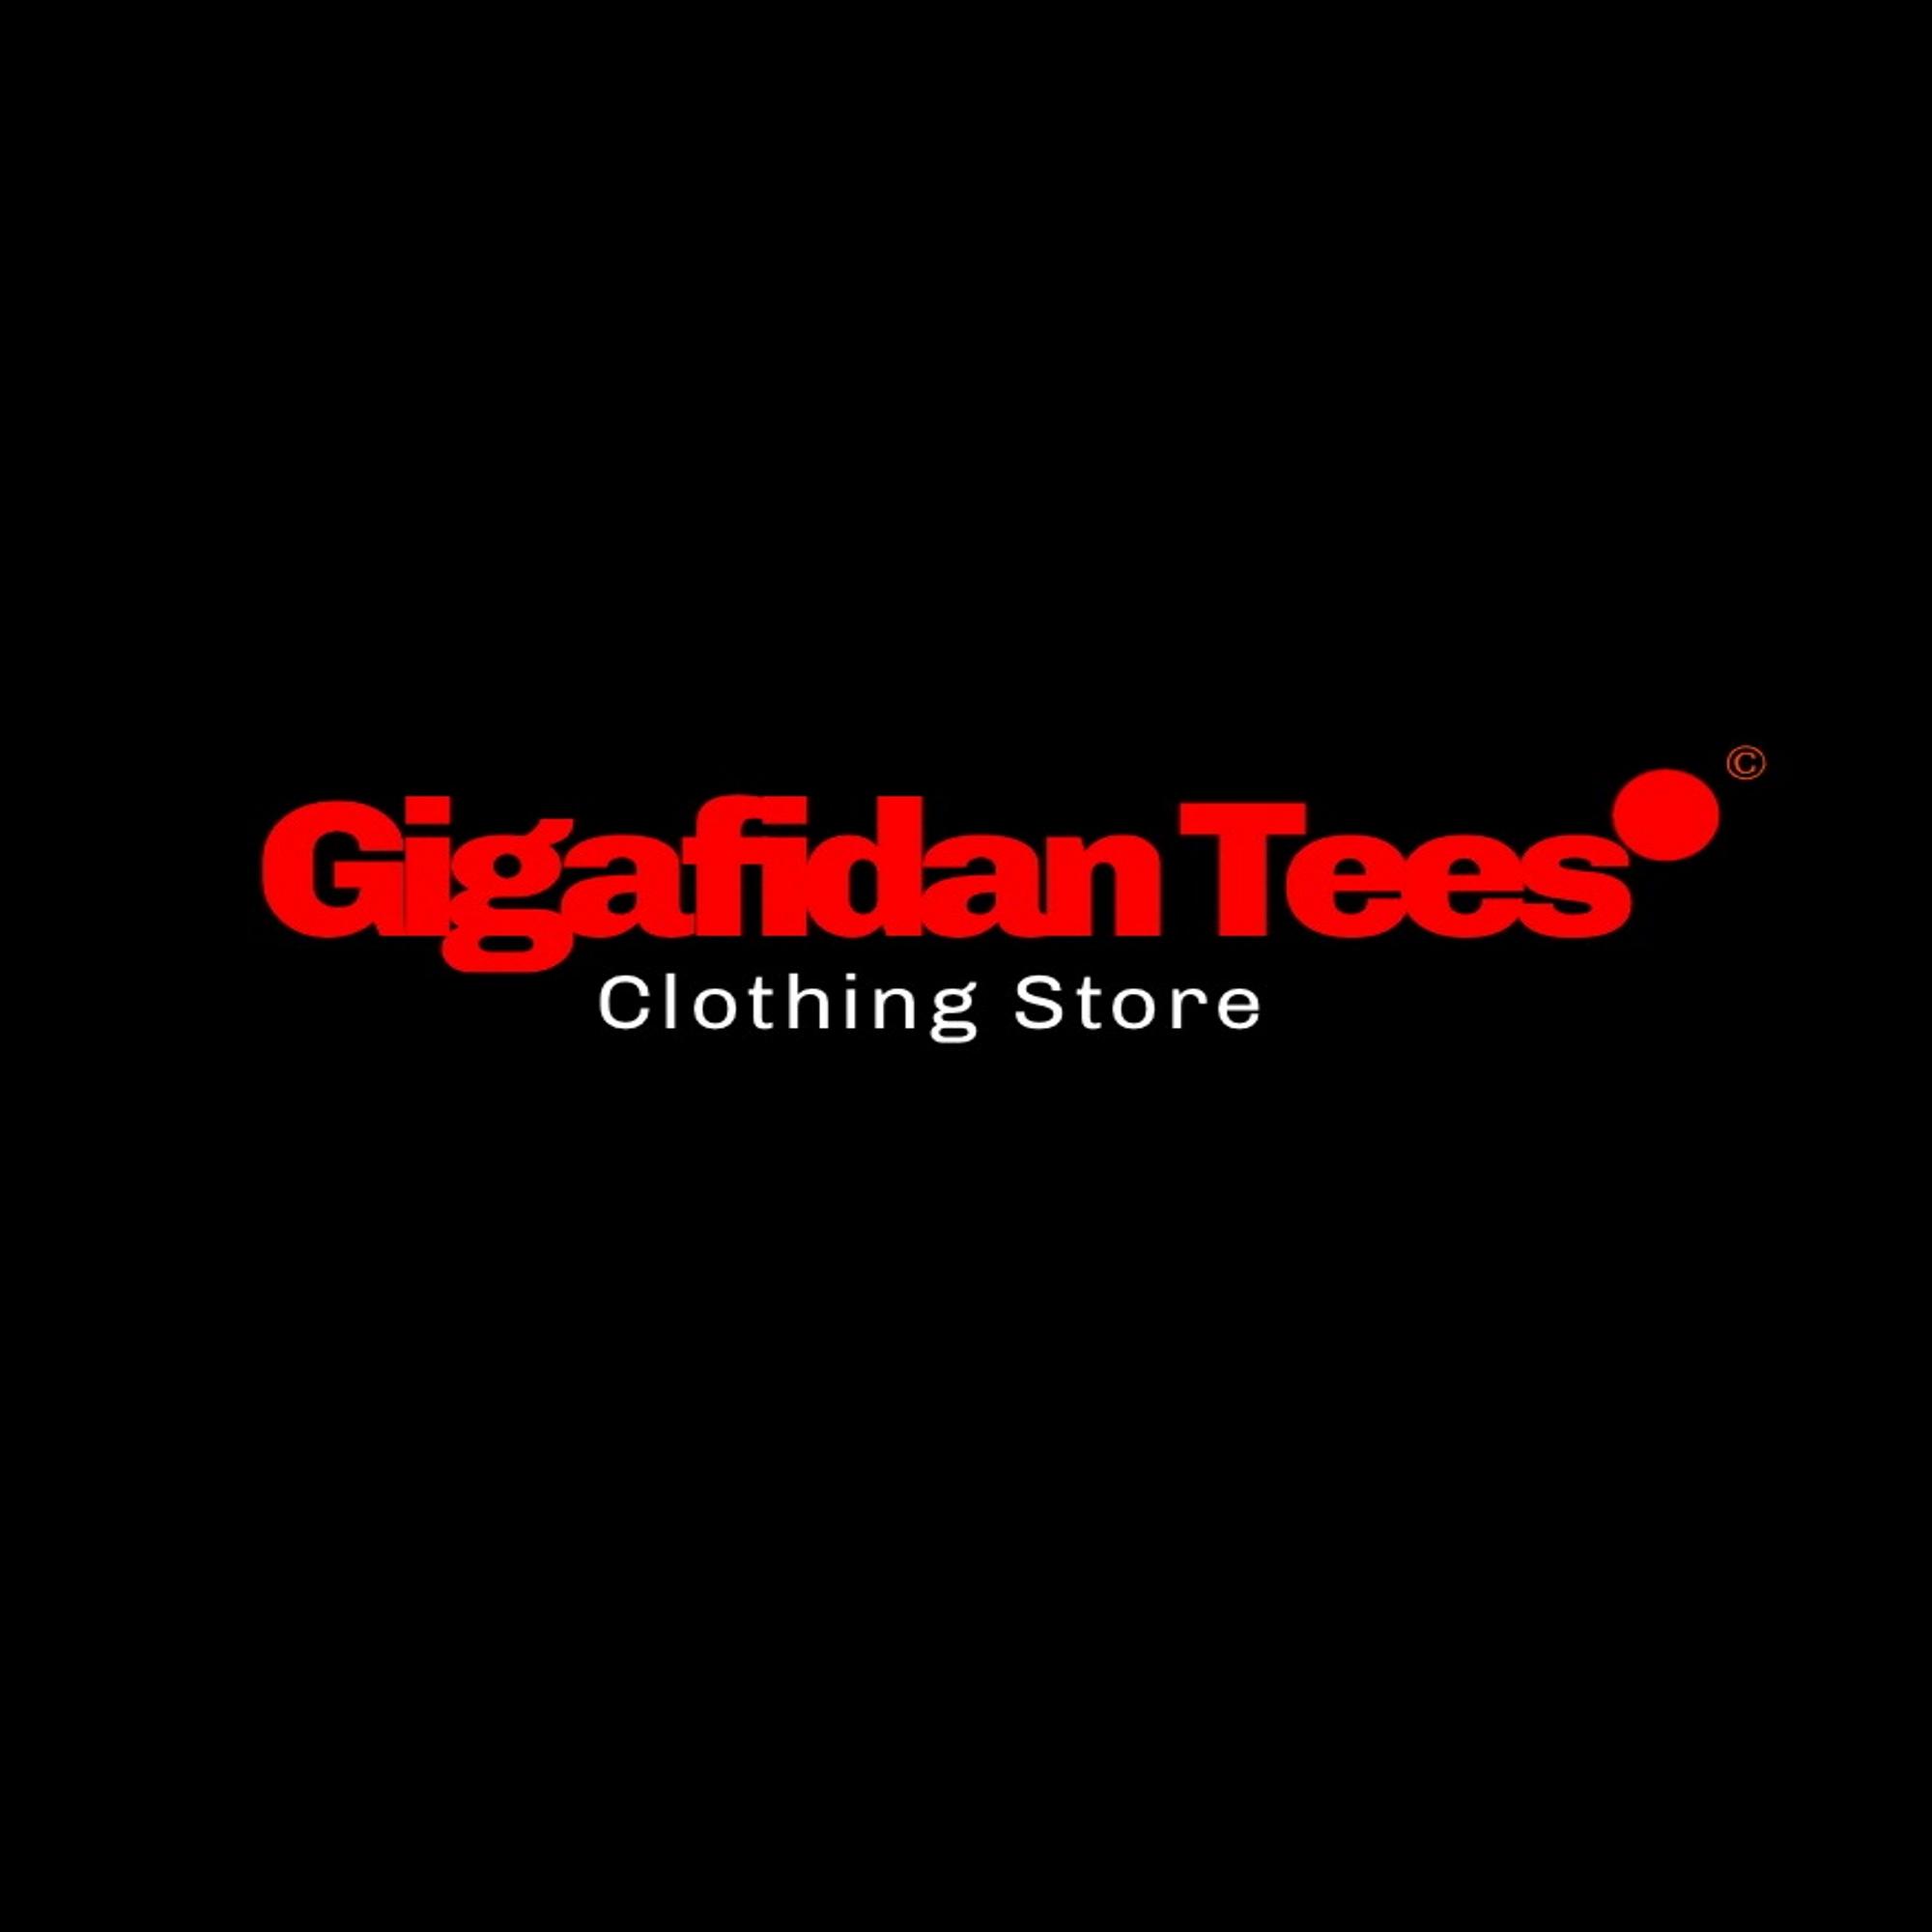 Gigafidan Tees Clothing Brand